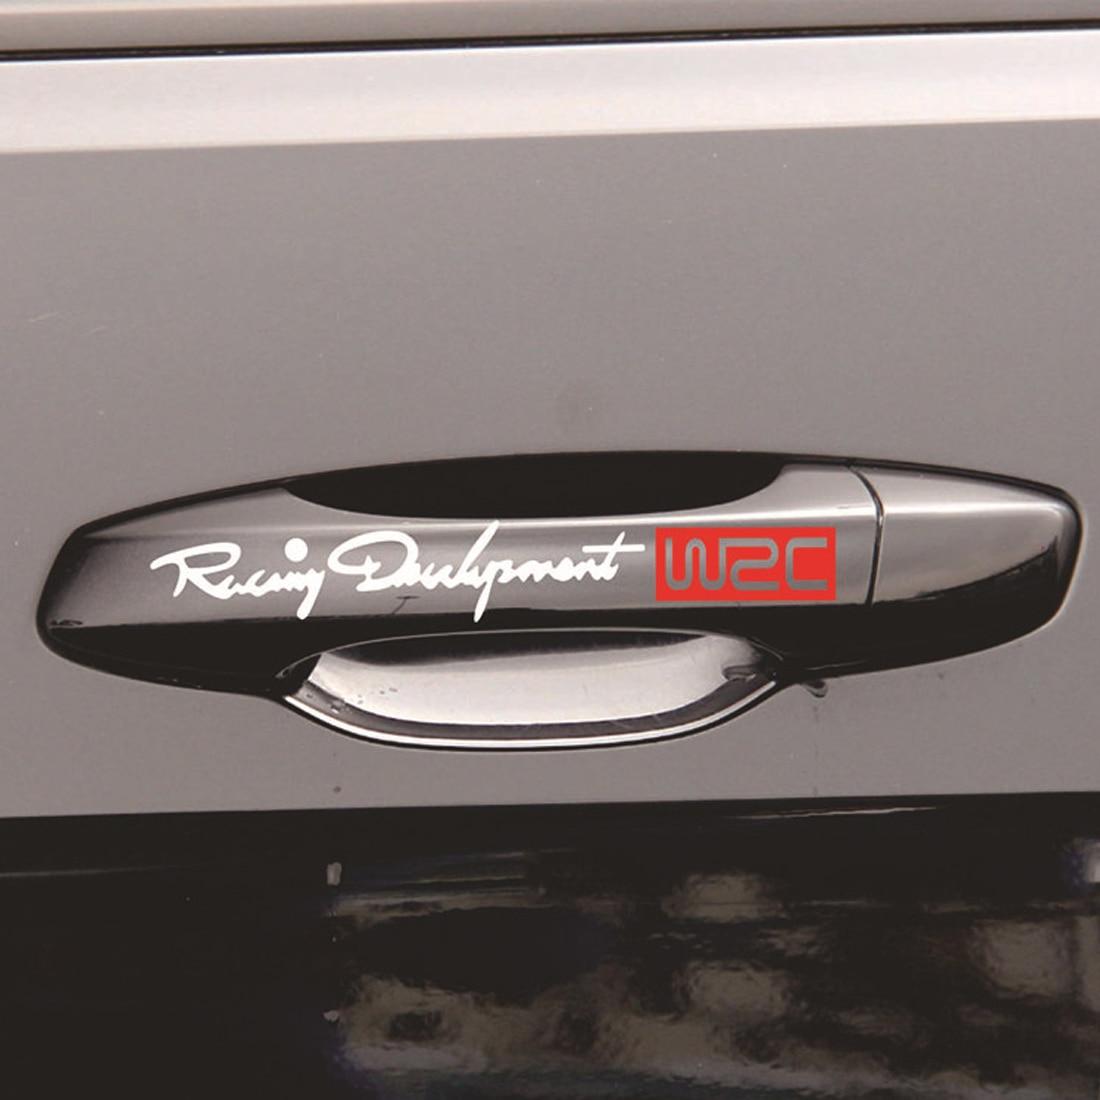 Dewtreetali 4Pcs Fashion Creative Auto Decorative Decals World Racing Development WRC Car Door Handle Vinyl Car Body Decals